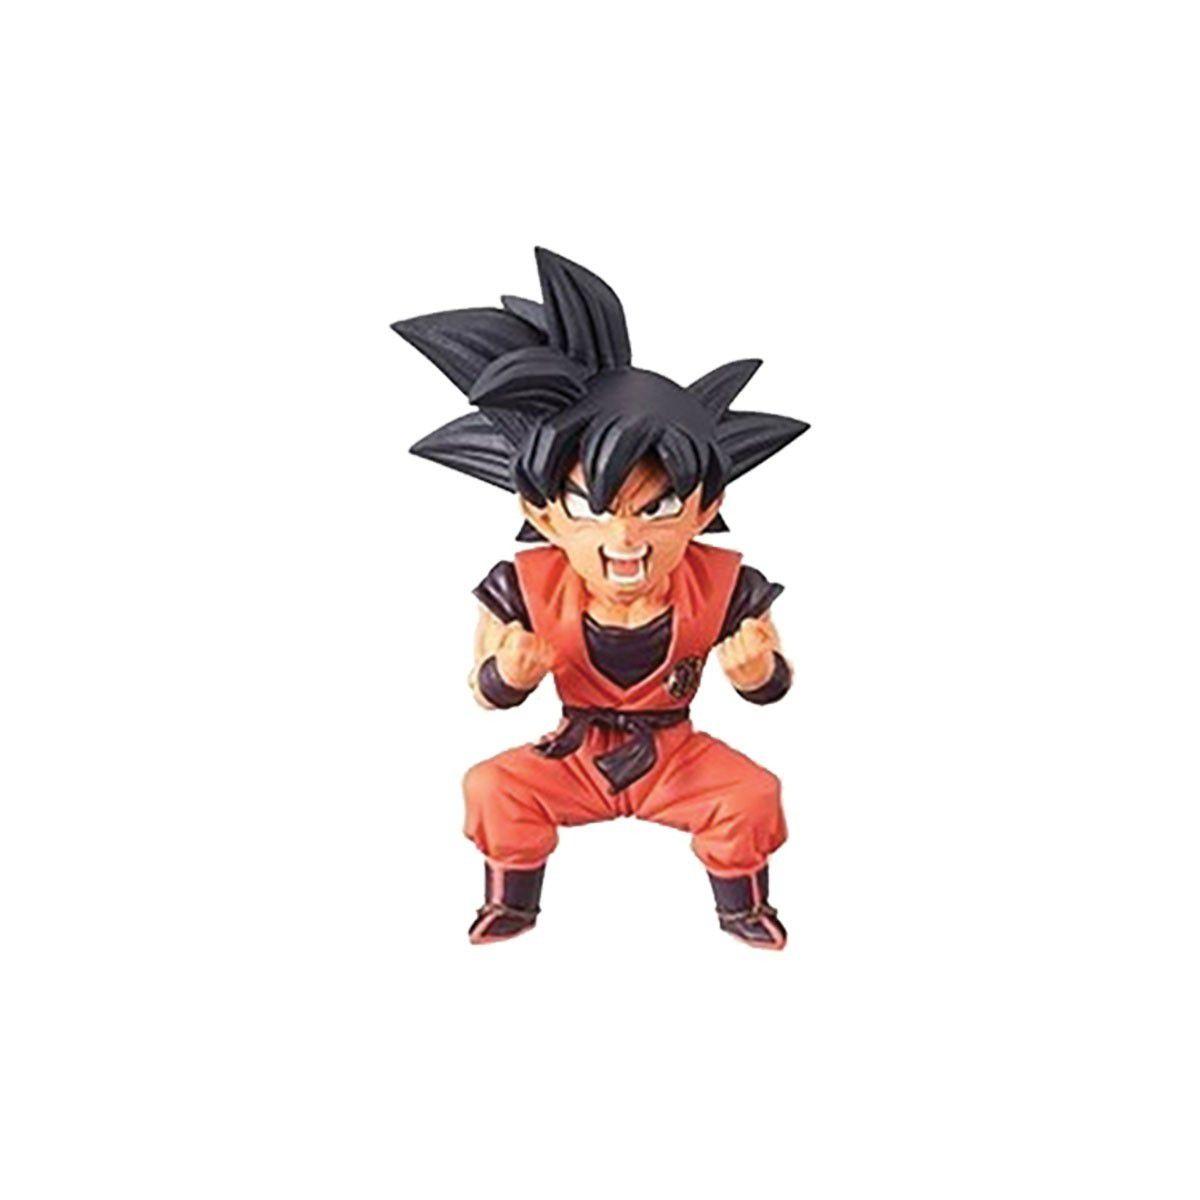 Action Figure Bandai Banpresto Wcf Son Goku 7cm Dragon Ball